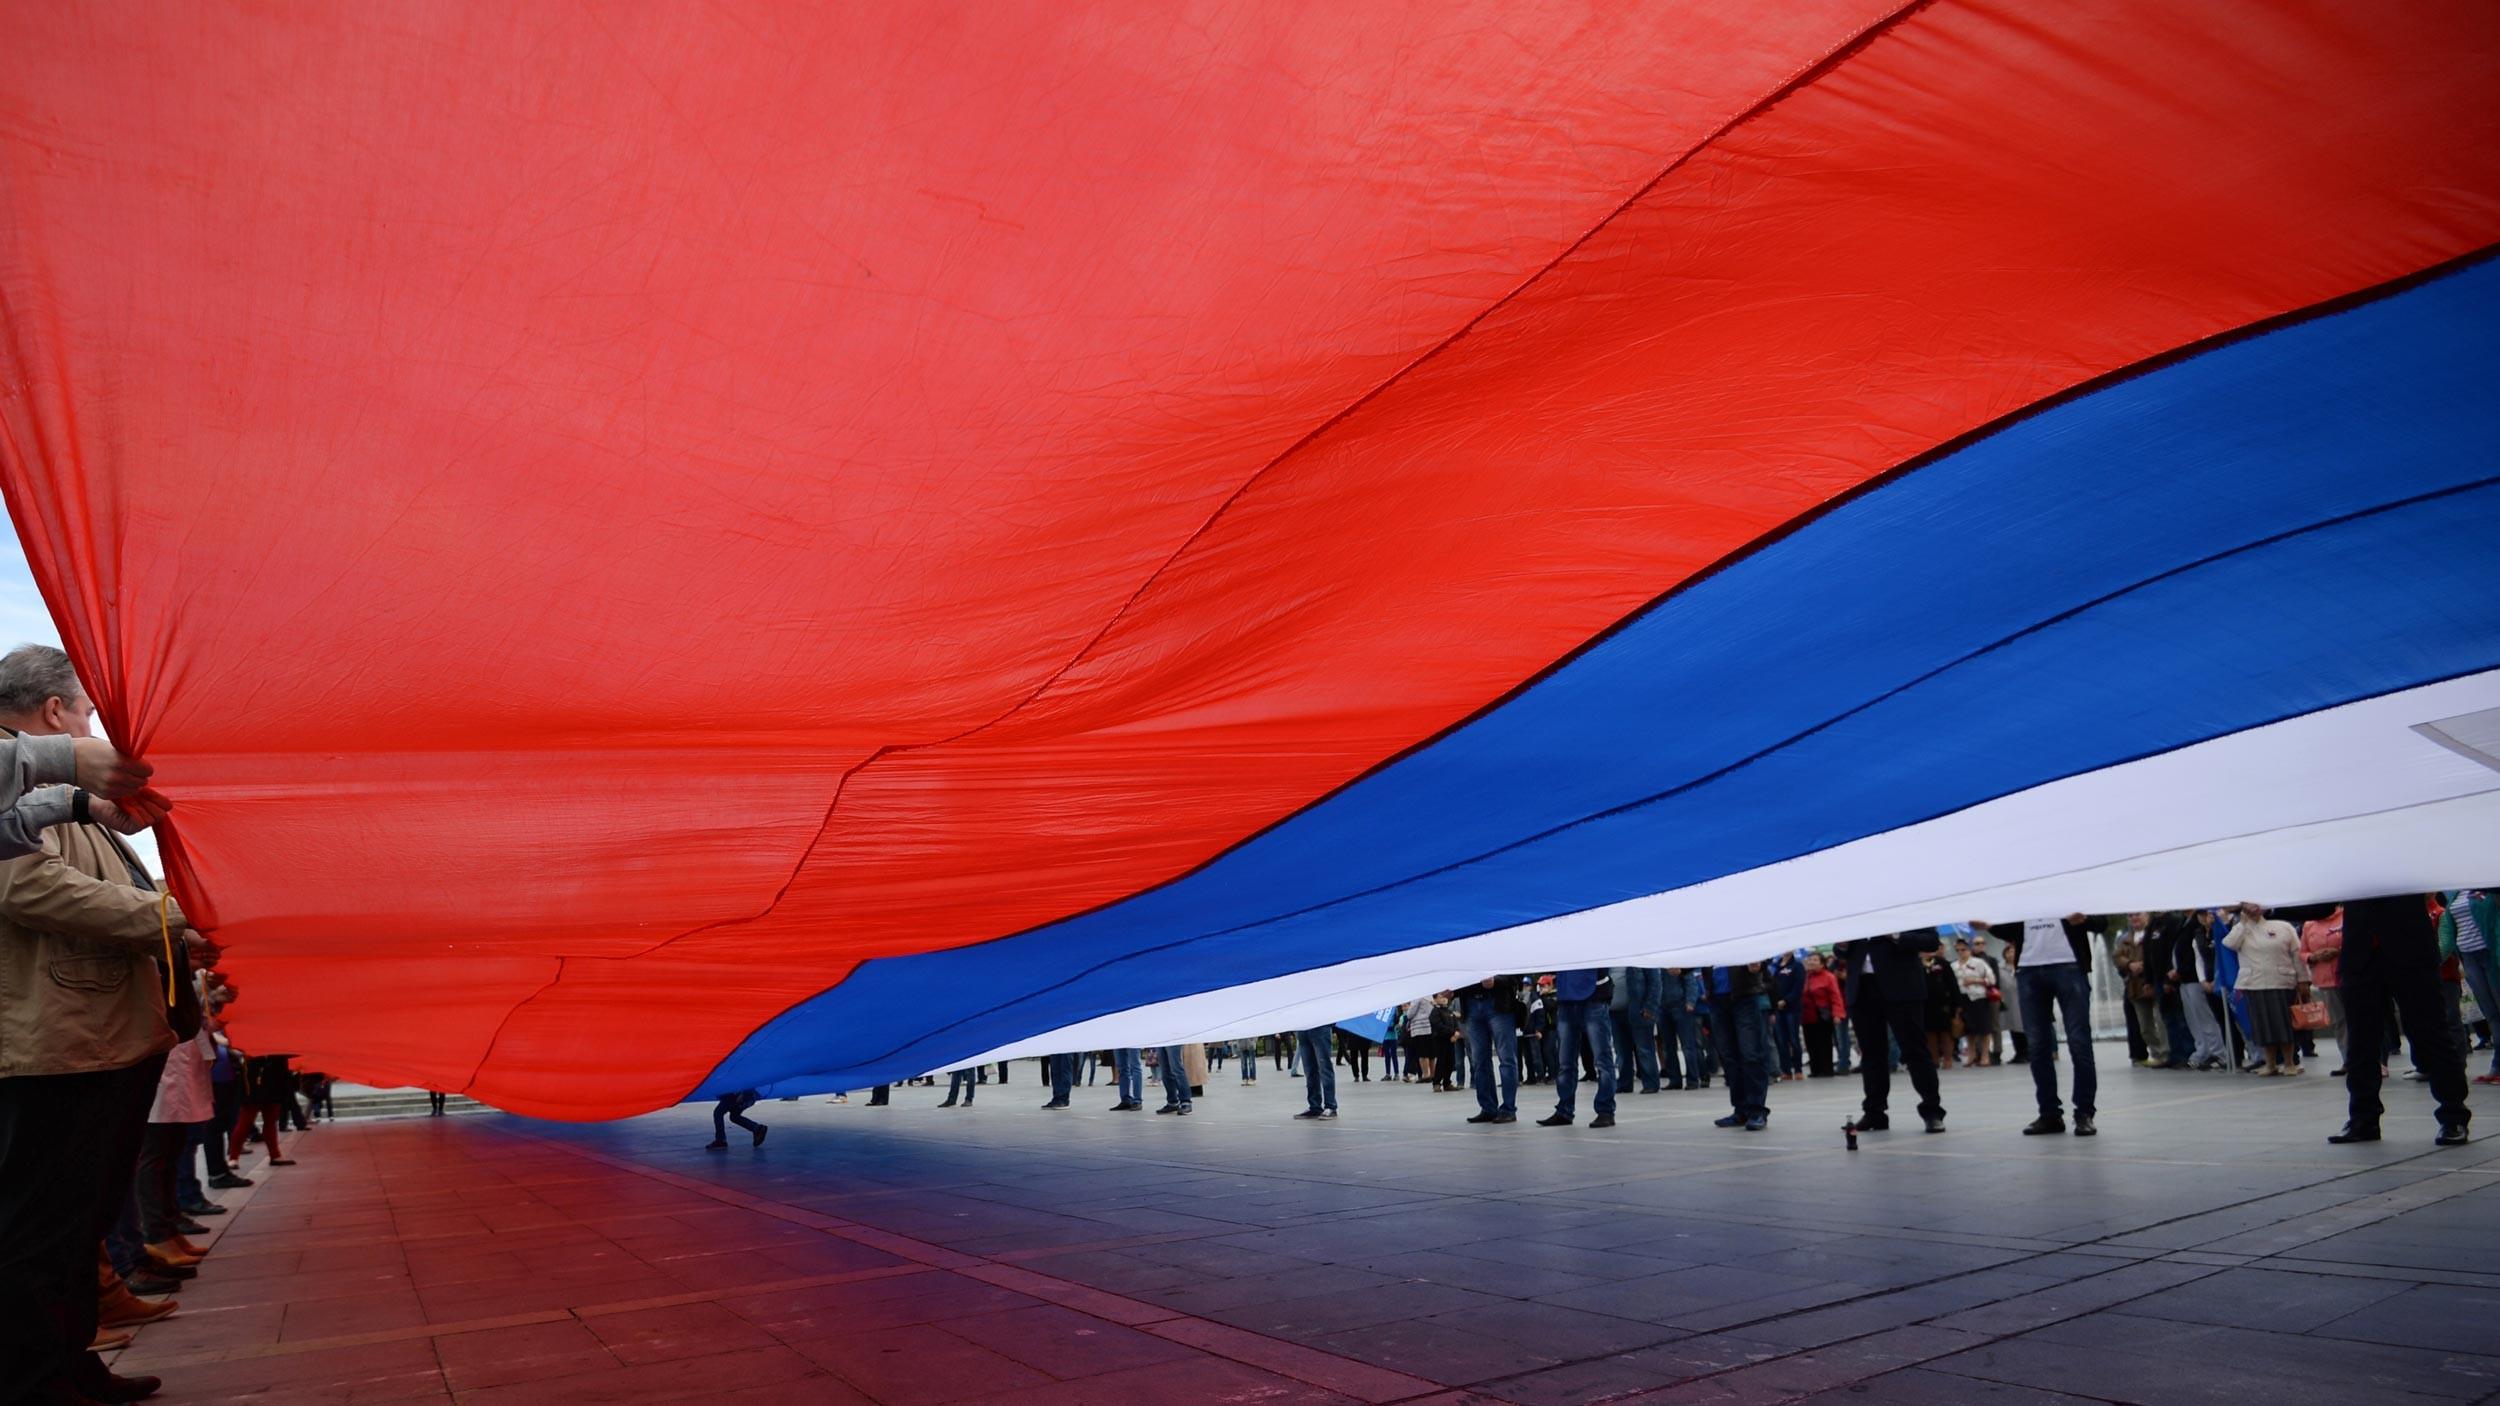 <p>Фото: &copy; РИА Новости/Павел Лисицын</p>